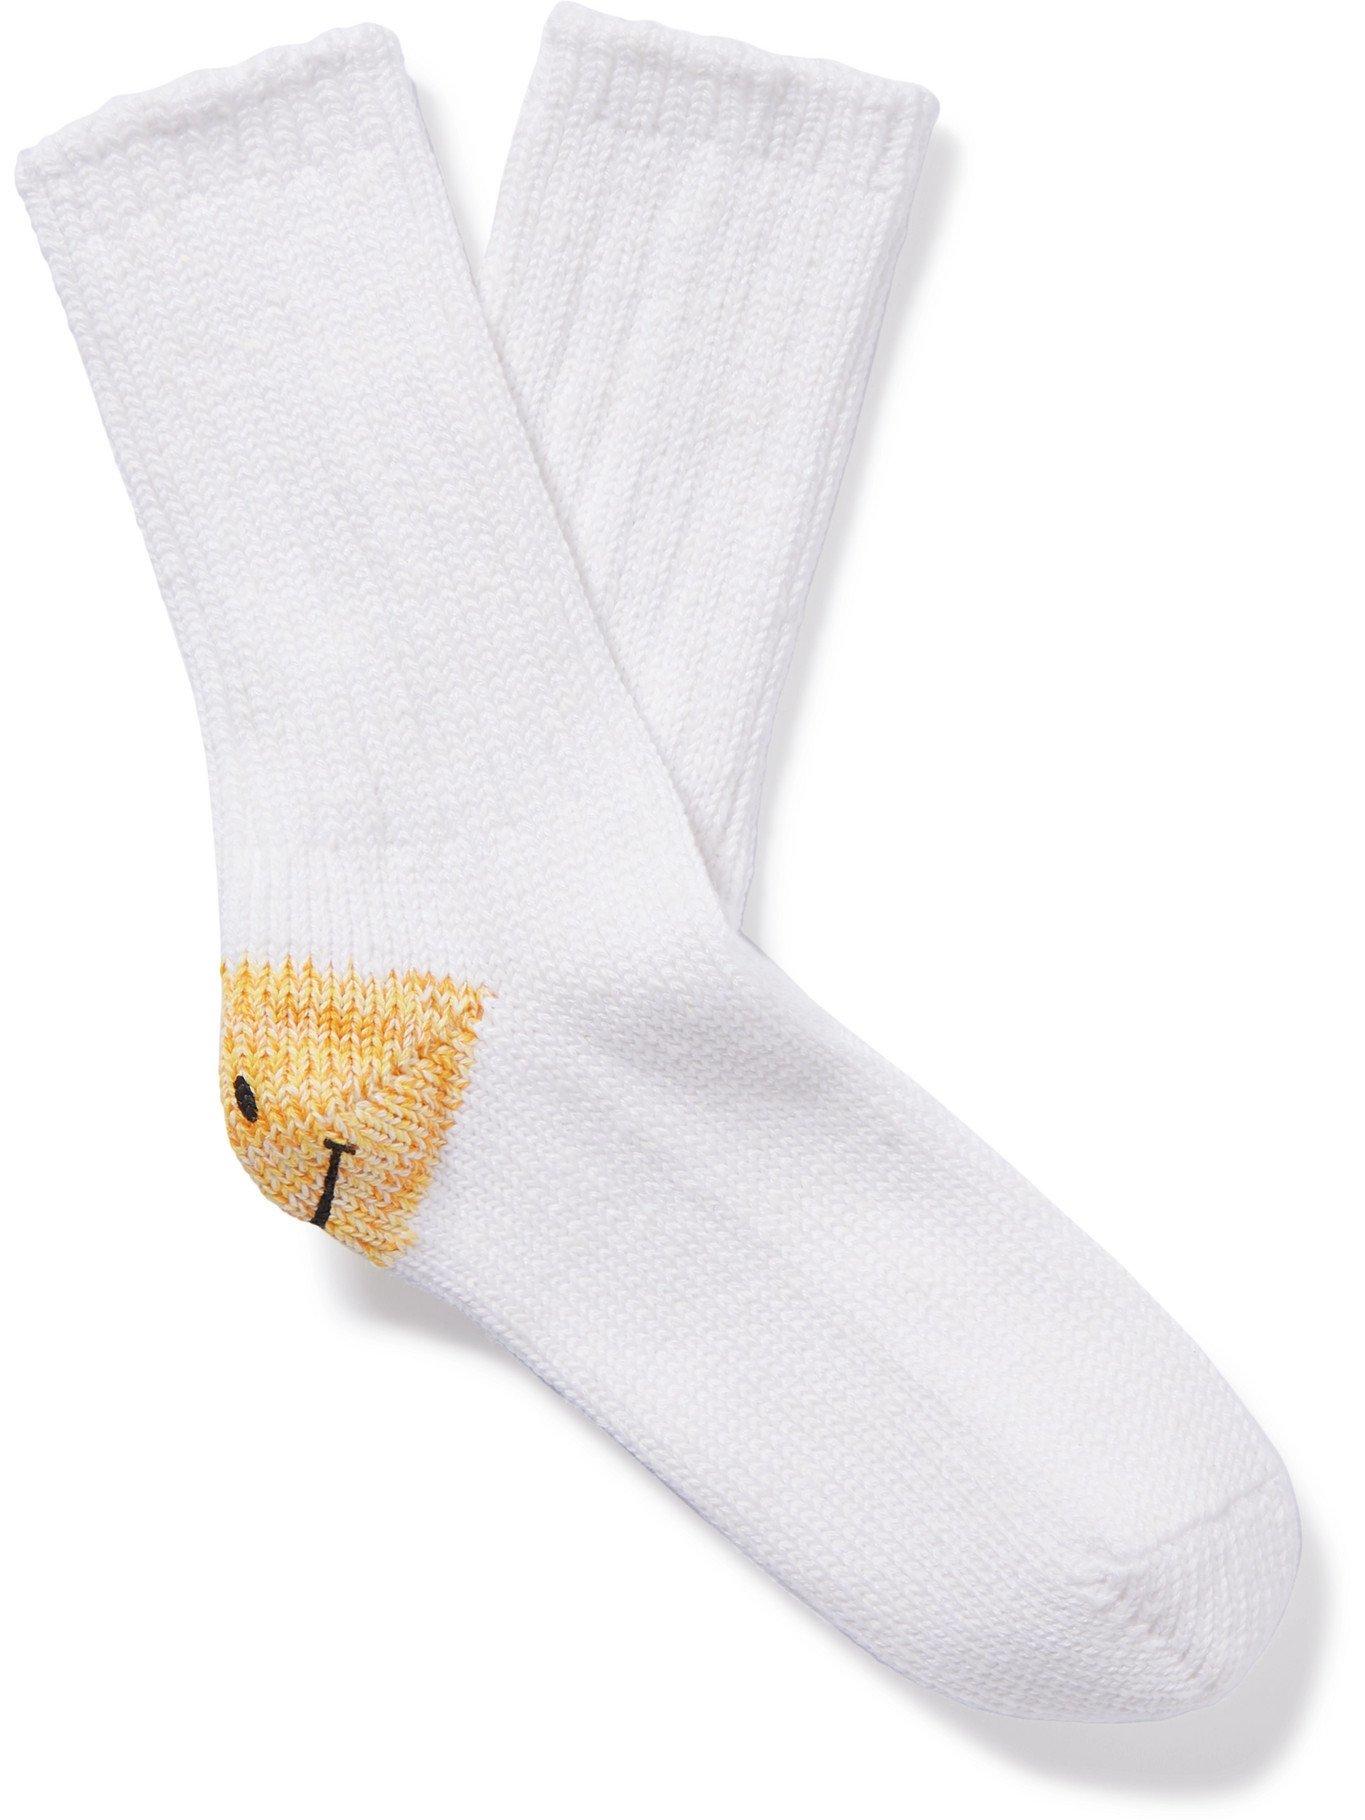 KAPITAL - Intarsia Cotton and Hemp-Blend Socks